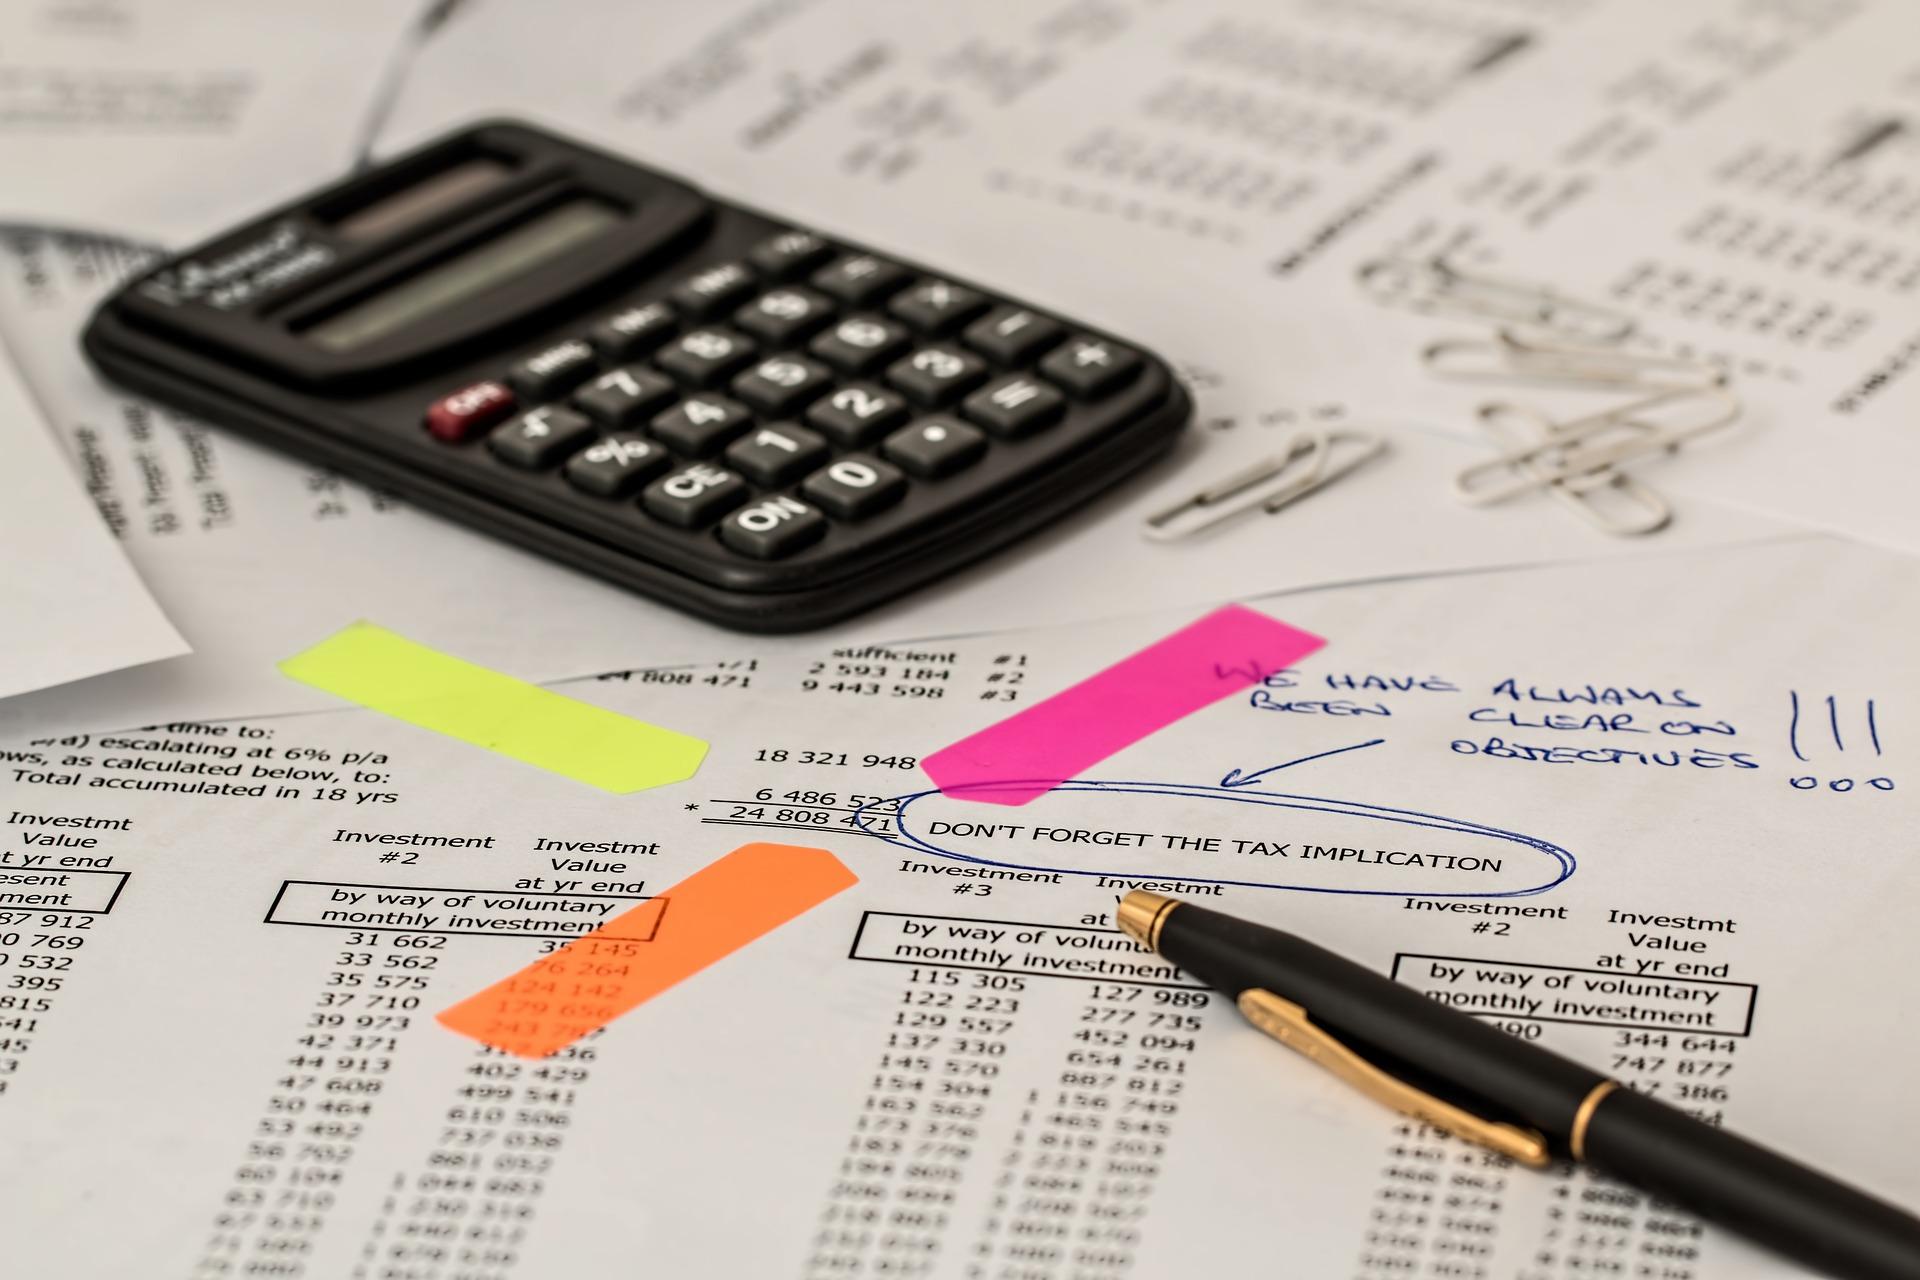 Inventory valuation methods